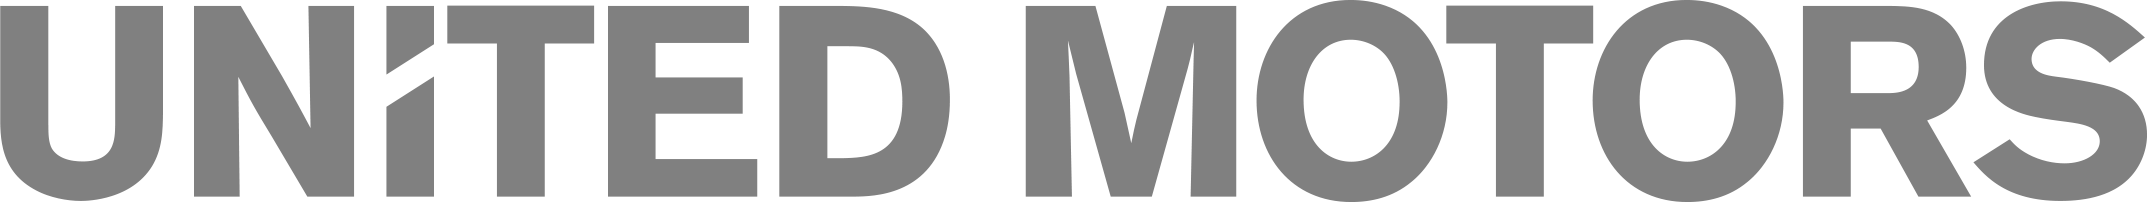 UnitedMotors_logo_RGB.png